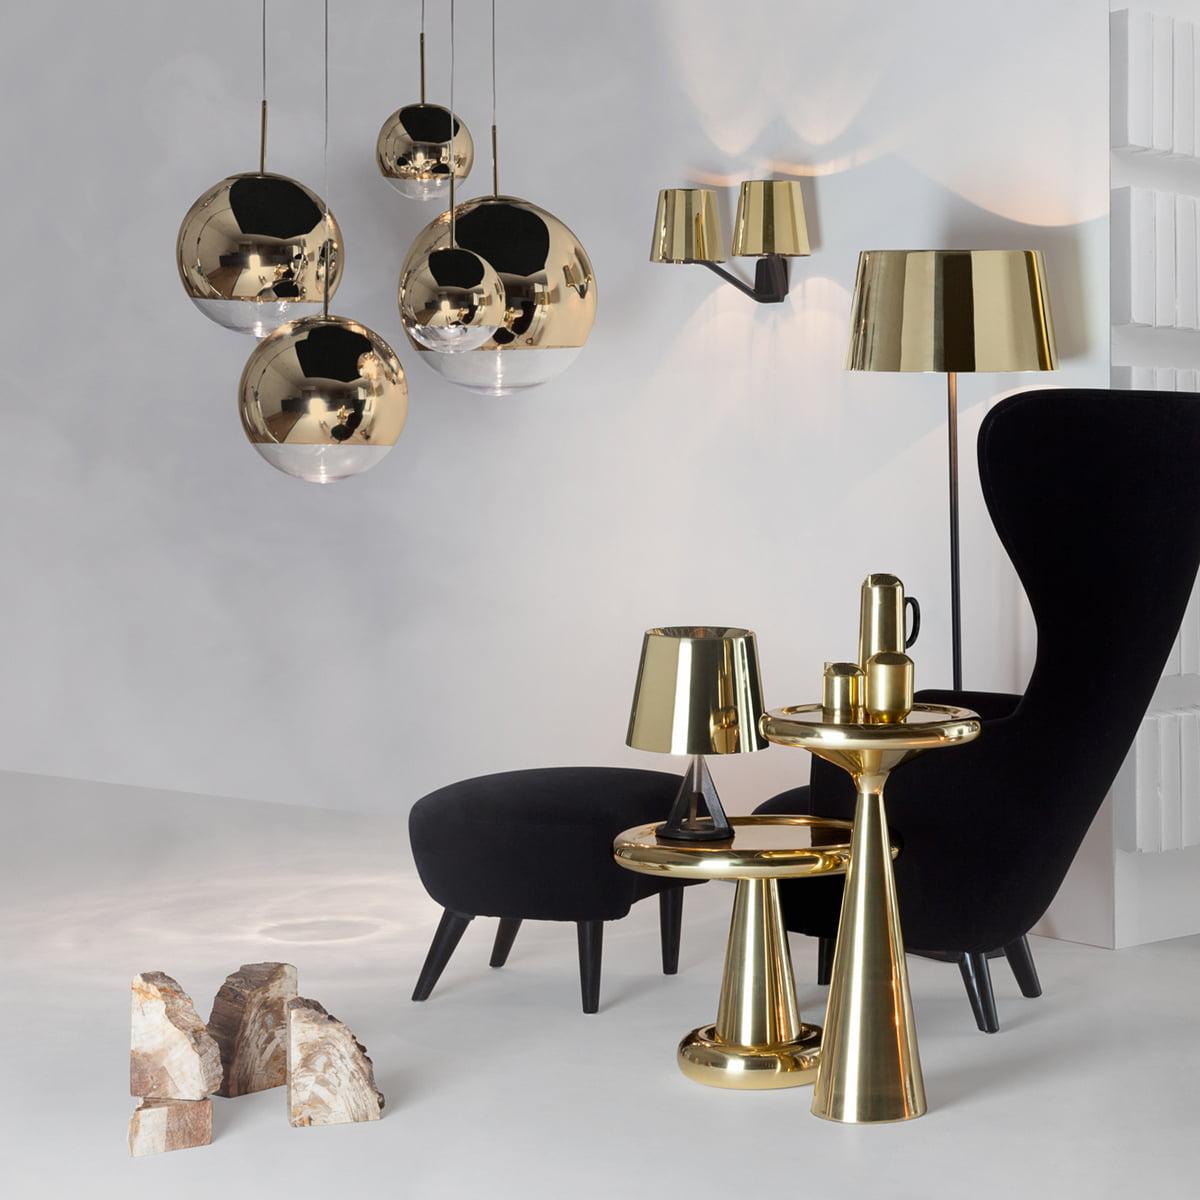 Tom Dixon - Mirror Ball Gold Pendant Lamp - Mirror Ball Gold Pendant Light By Tom Dixon